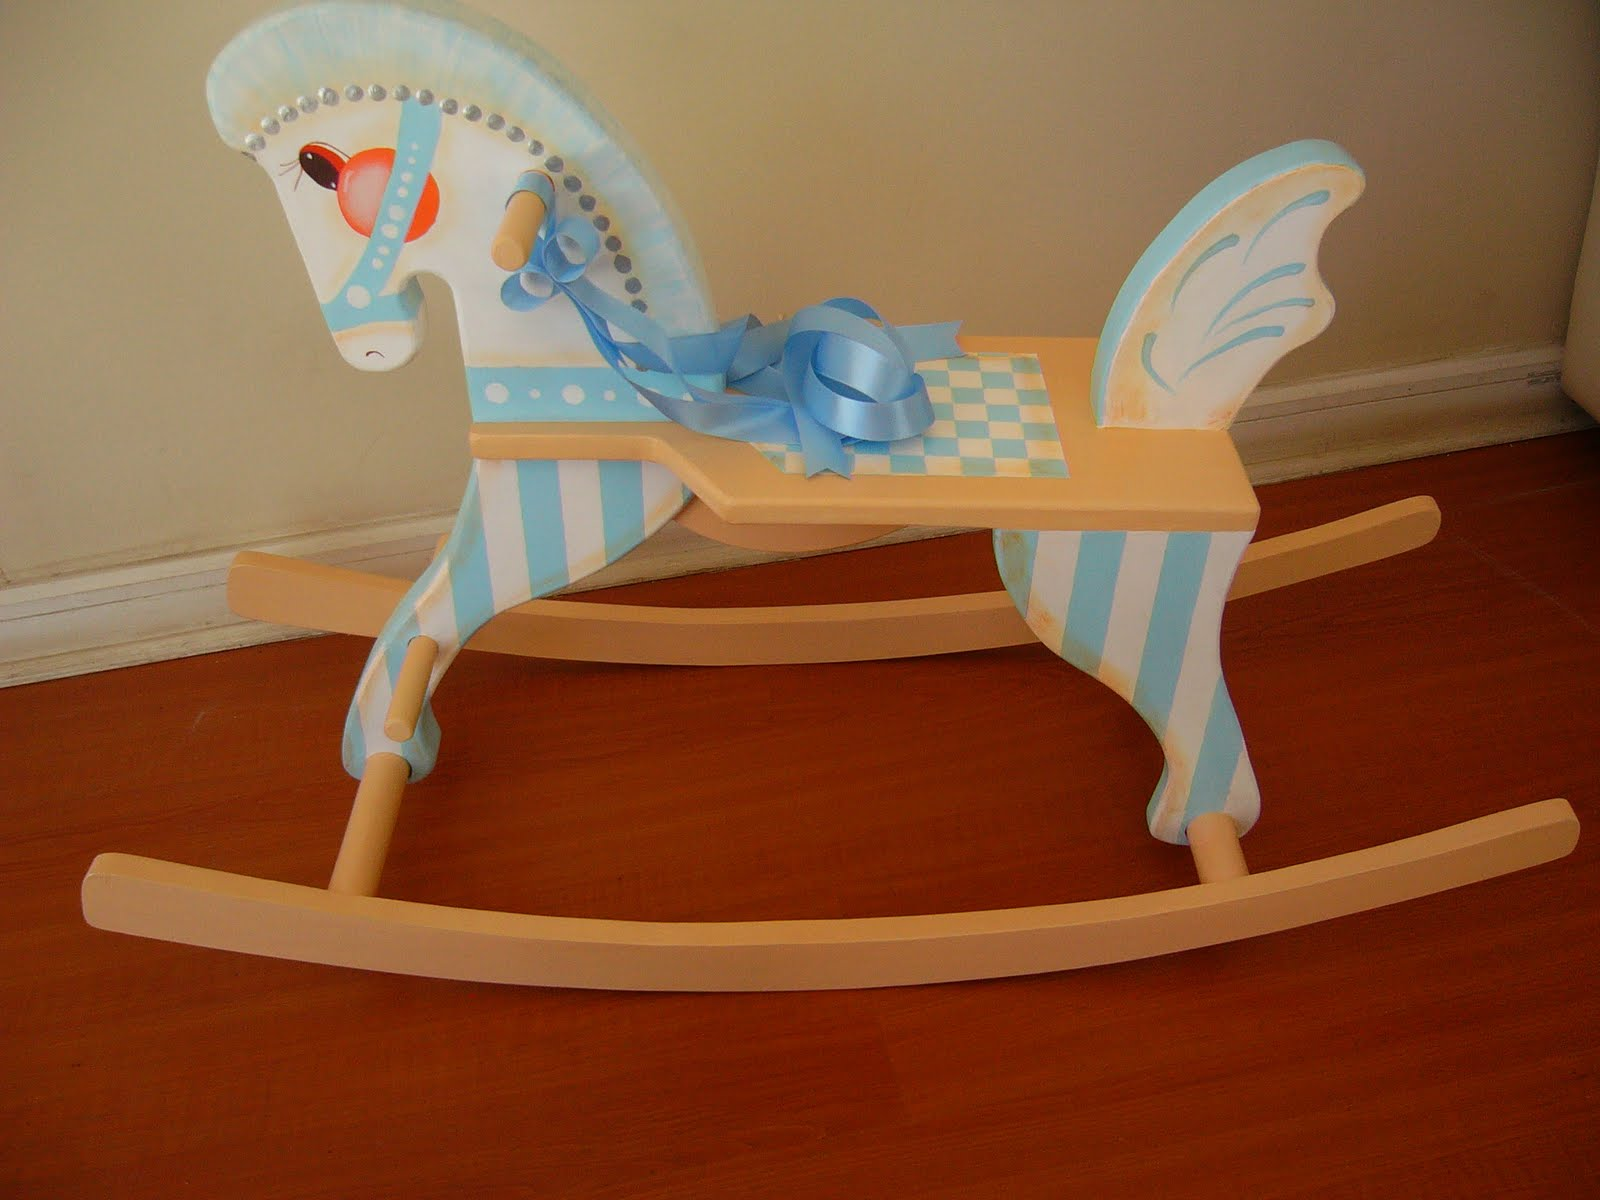 Muebles infantiles decoraci n para ni os juguetes for Muebles de madera para ninos